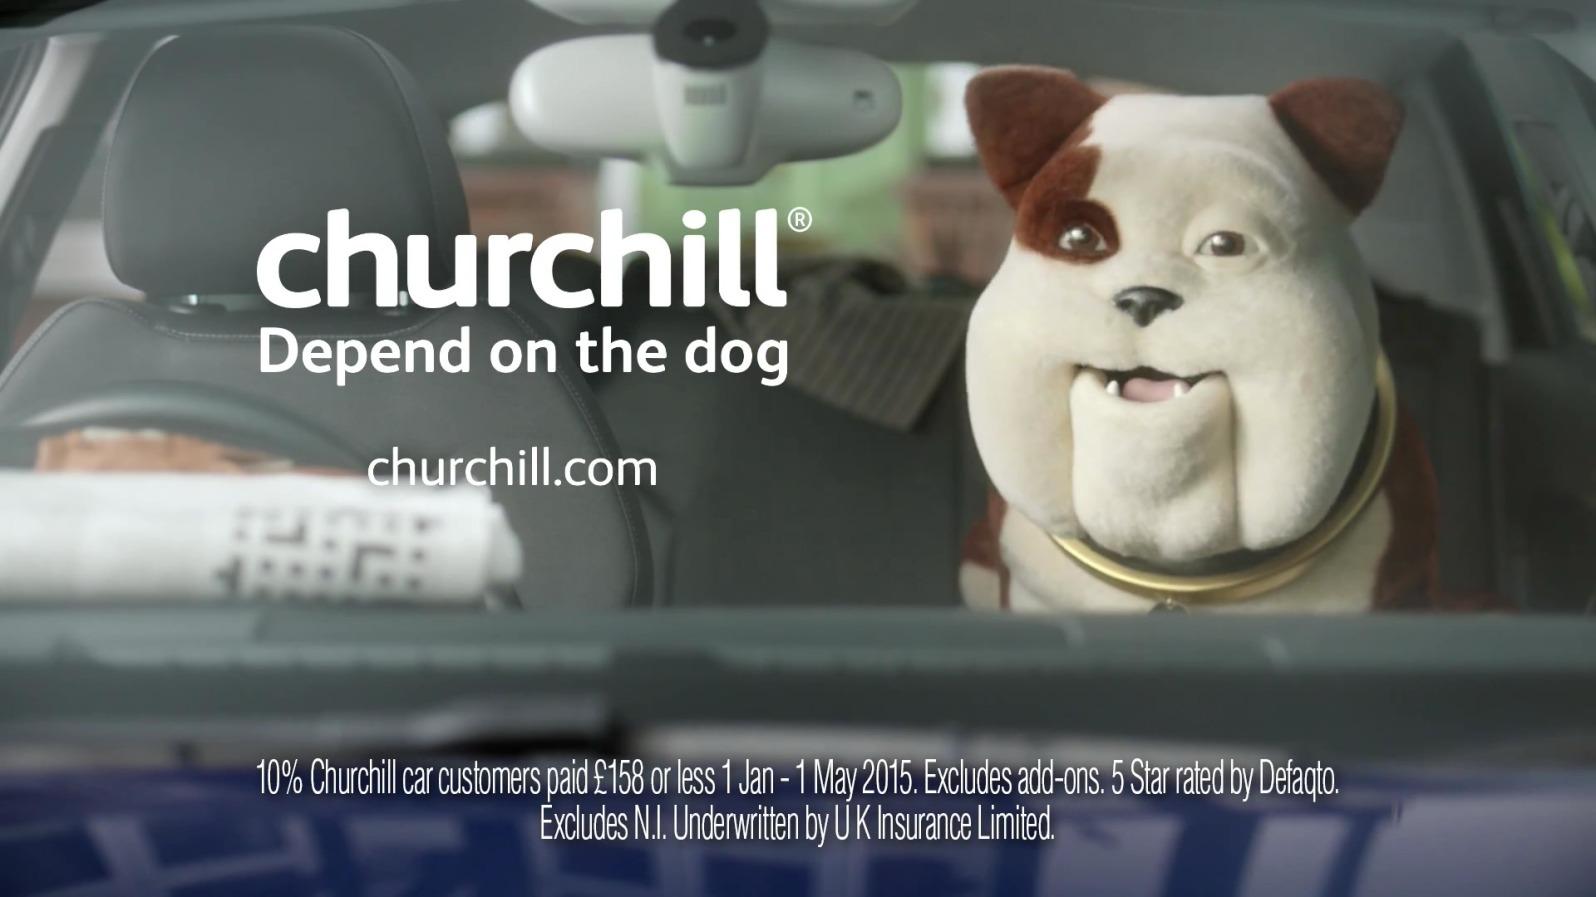 sc-churchill-car-stereo-3